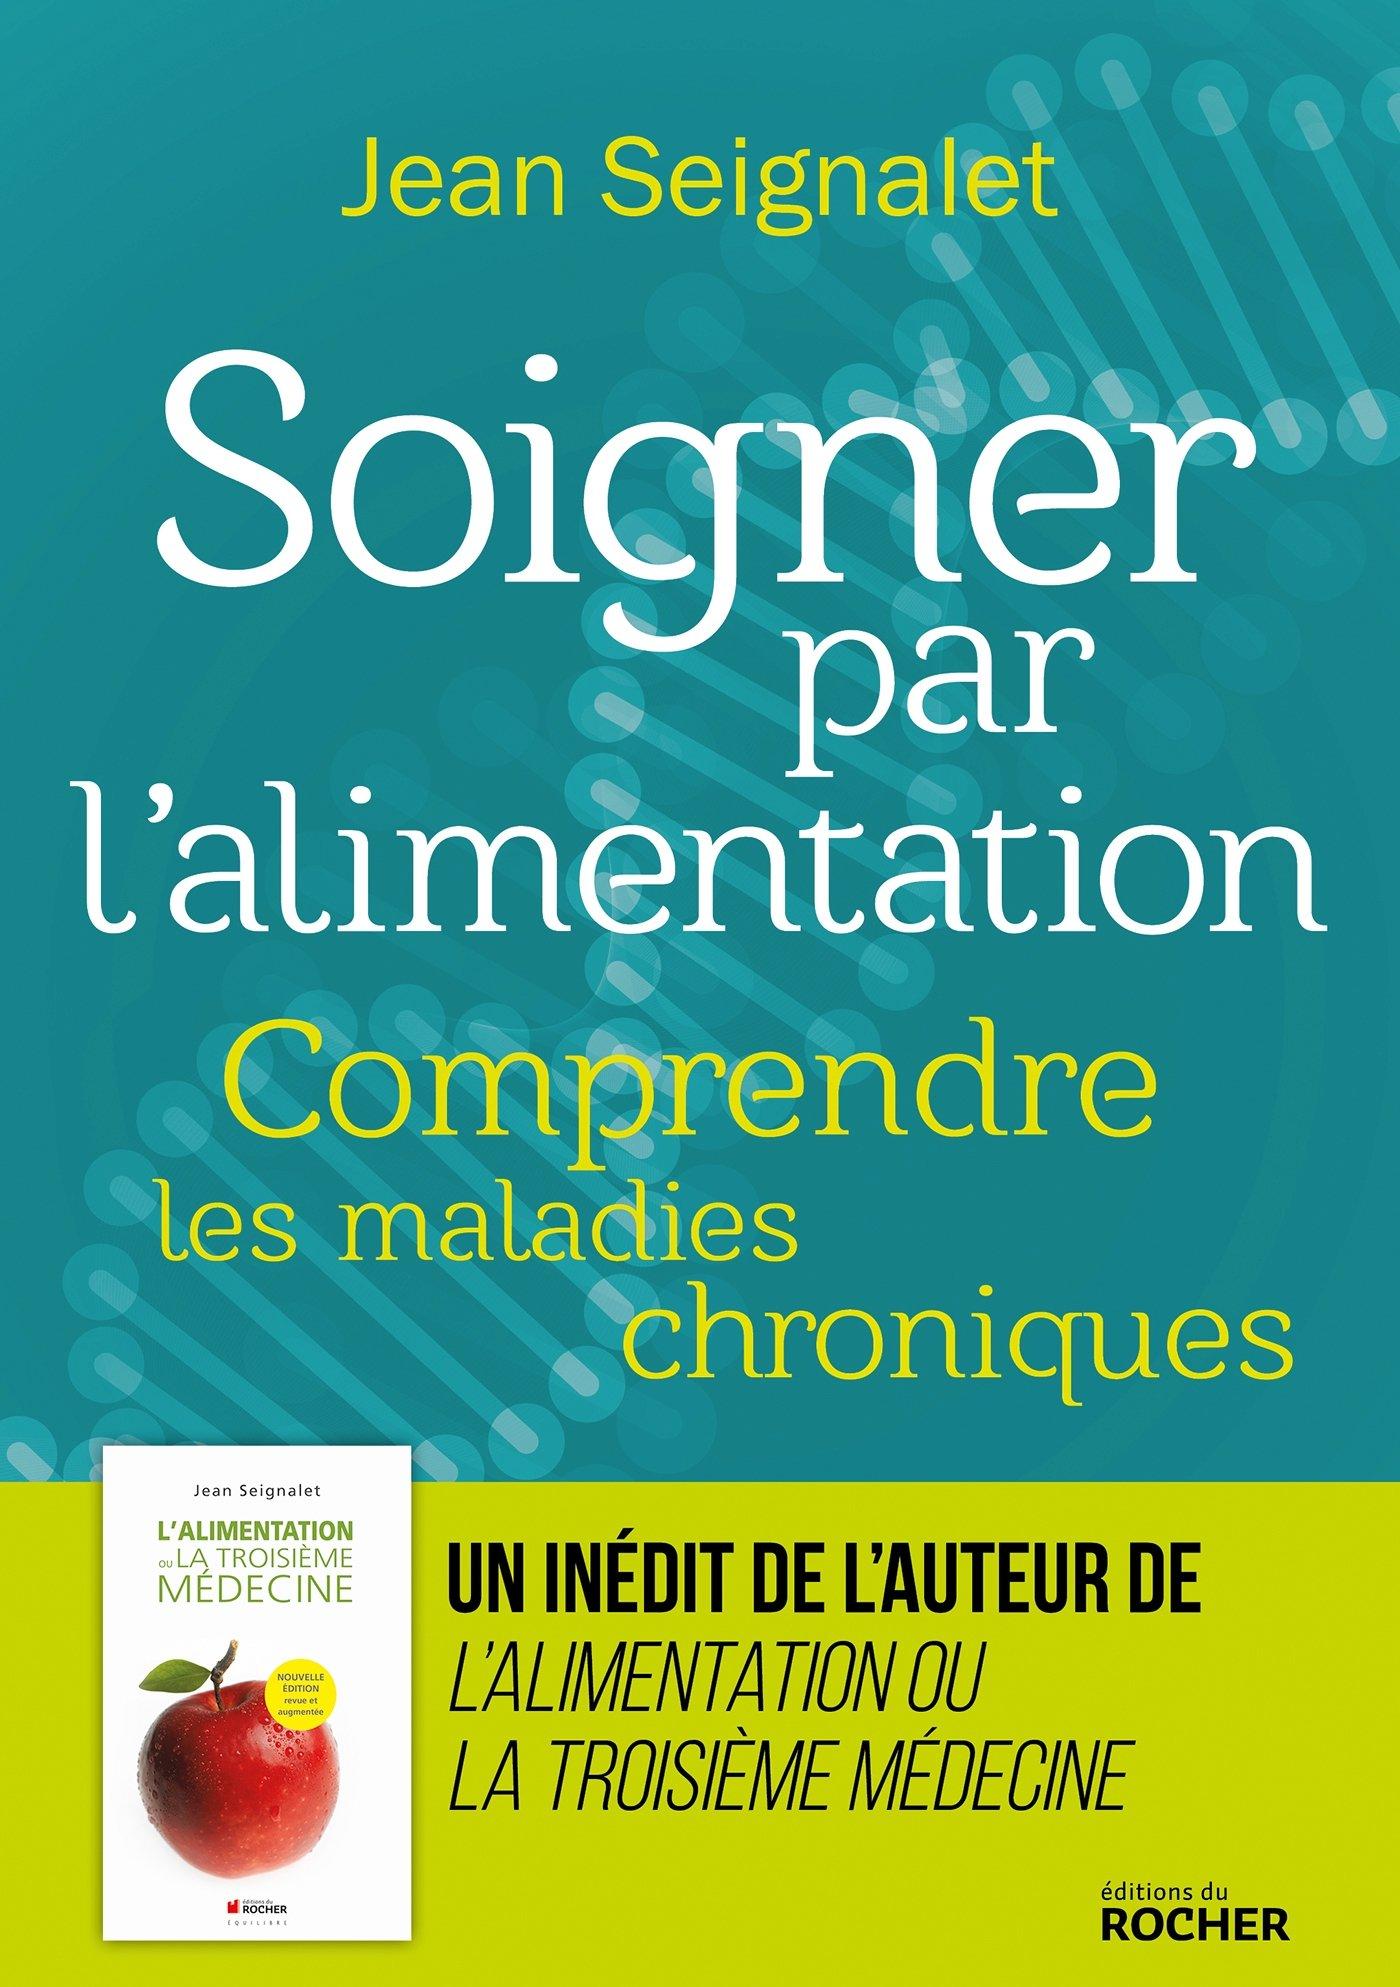 Soigner par l'alimentation, de Jean Seignalet : polyarthrite rhumatoïde, fibromyalgie et maladie de Crohn